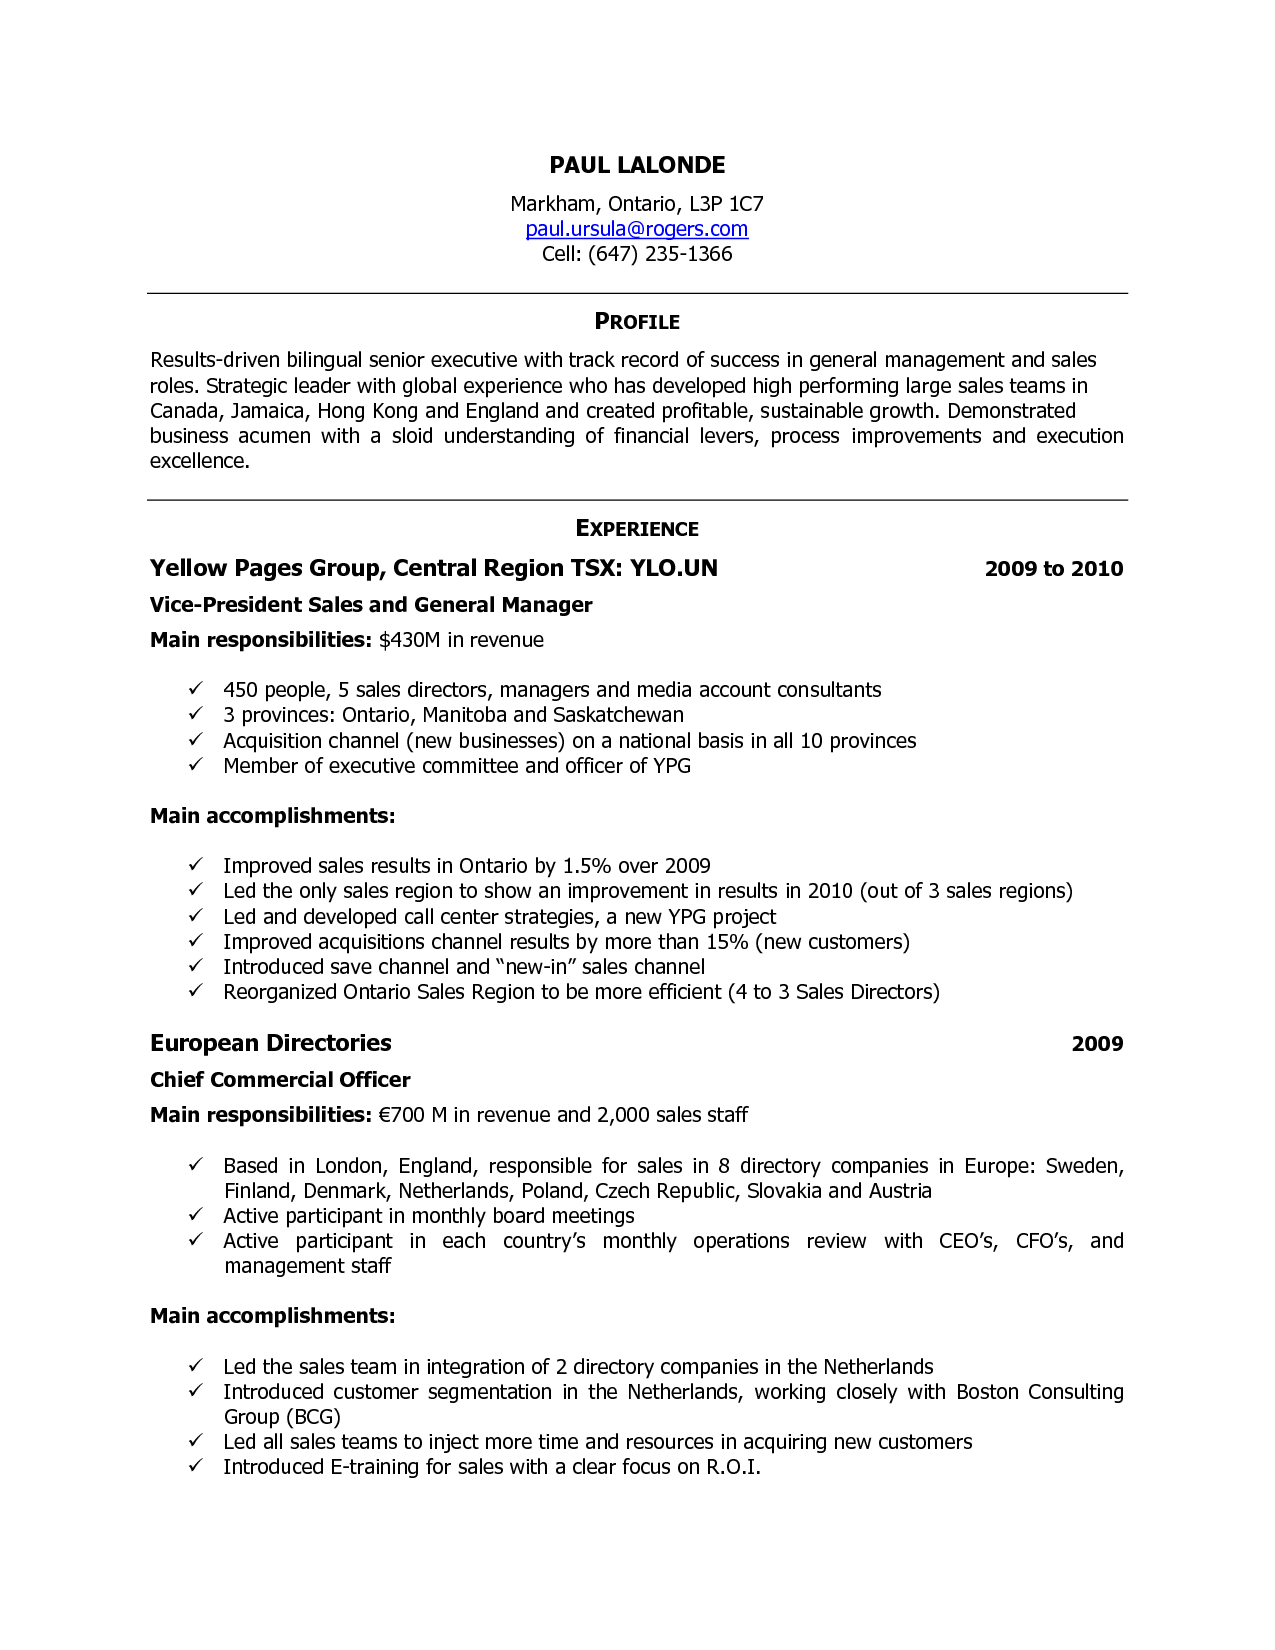 Free Resume Templates Canada Resume template free